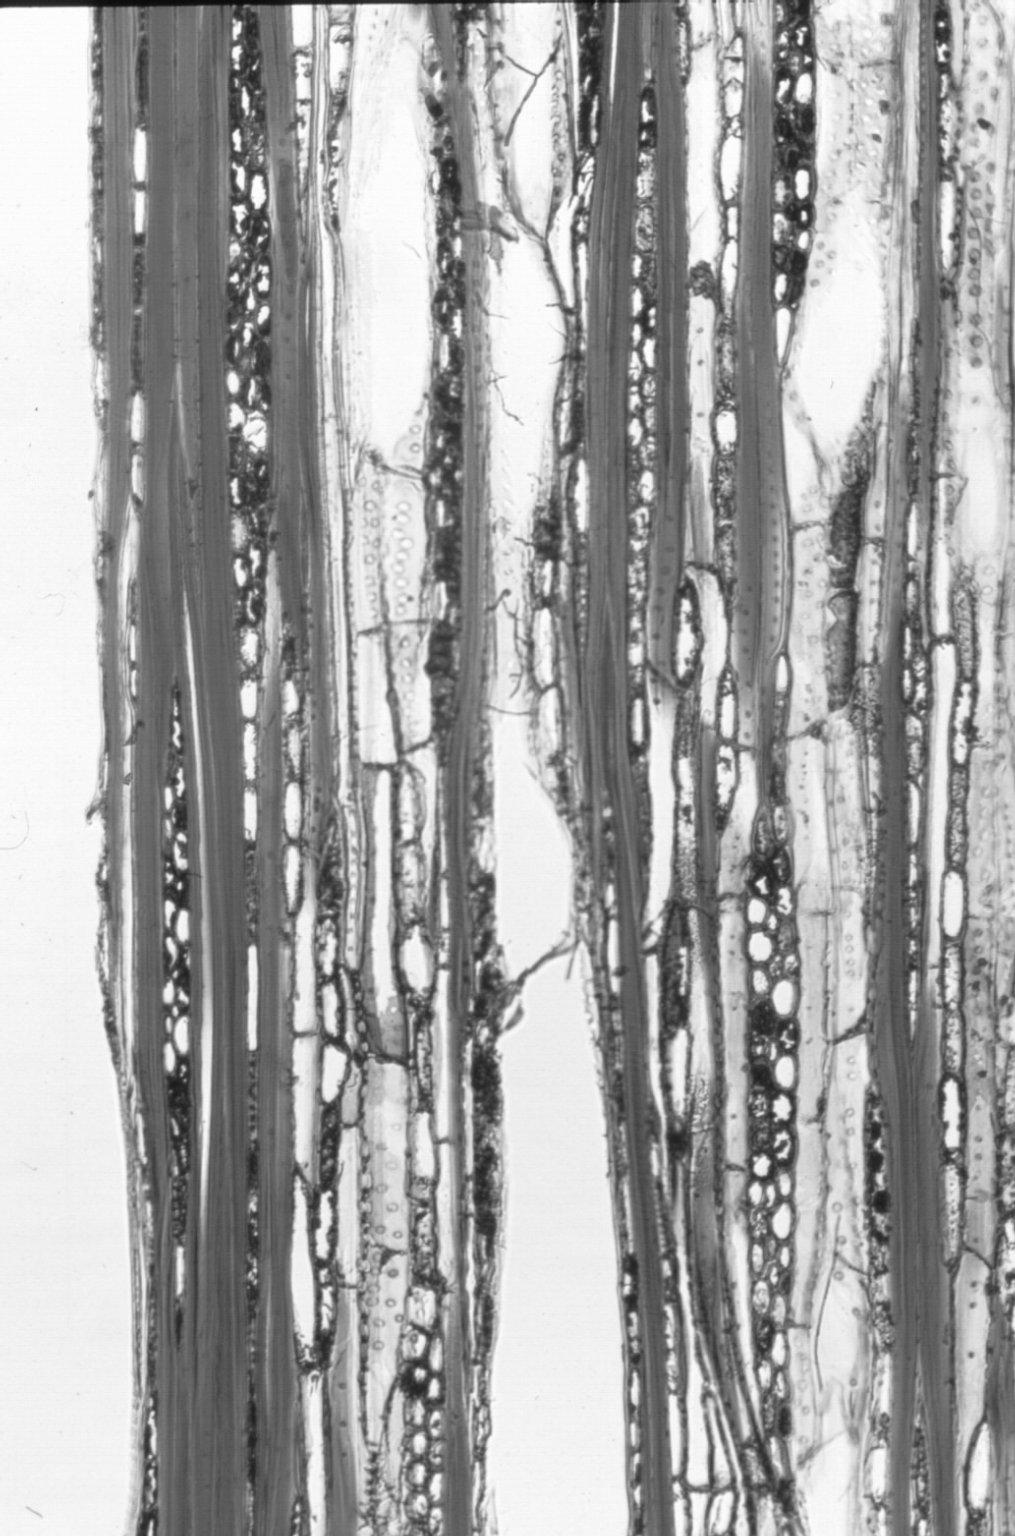 PICRODENDRACEAE Austrobuxus swainii